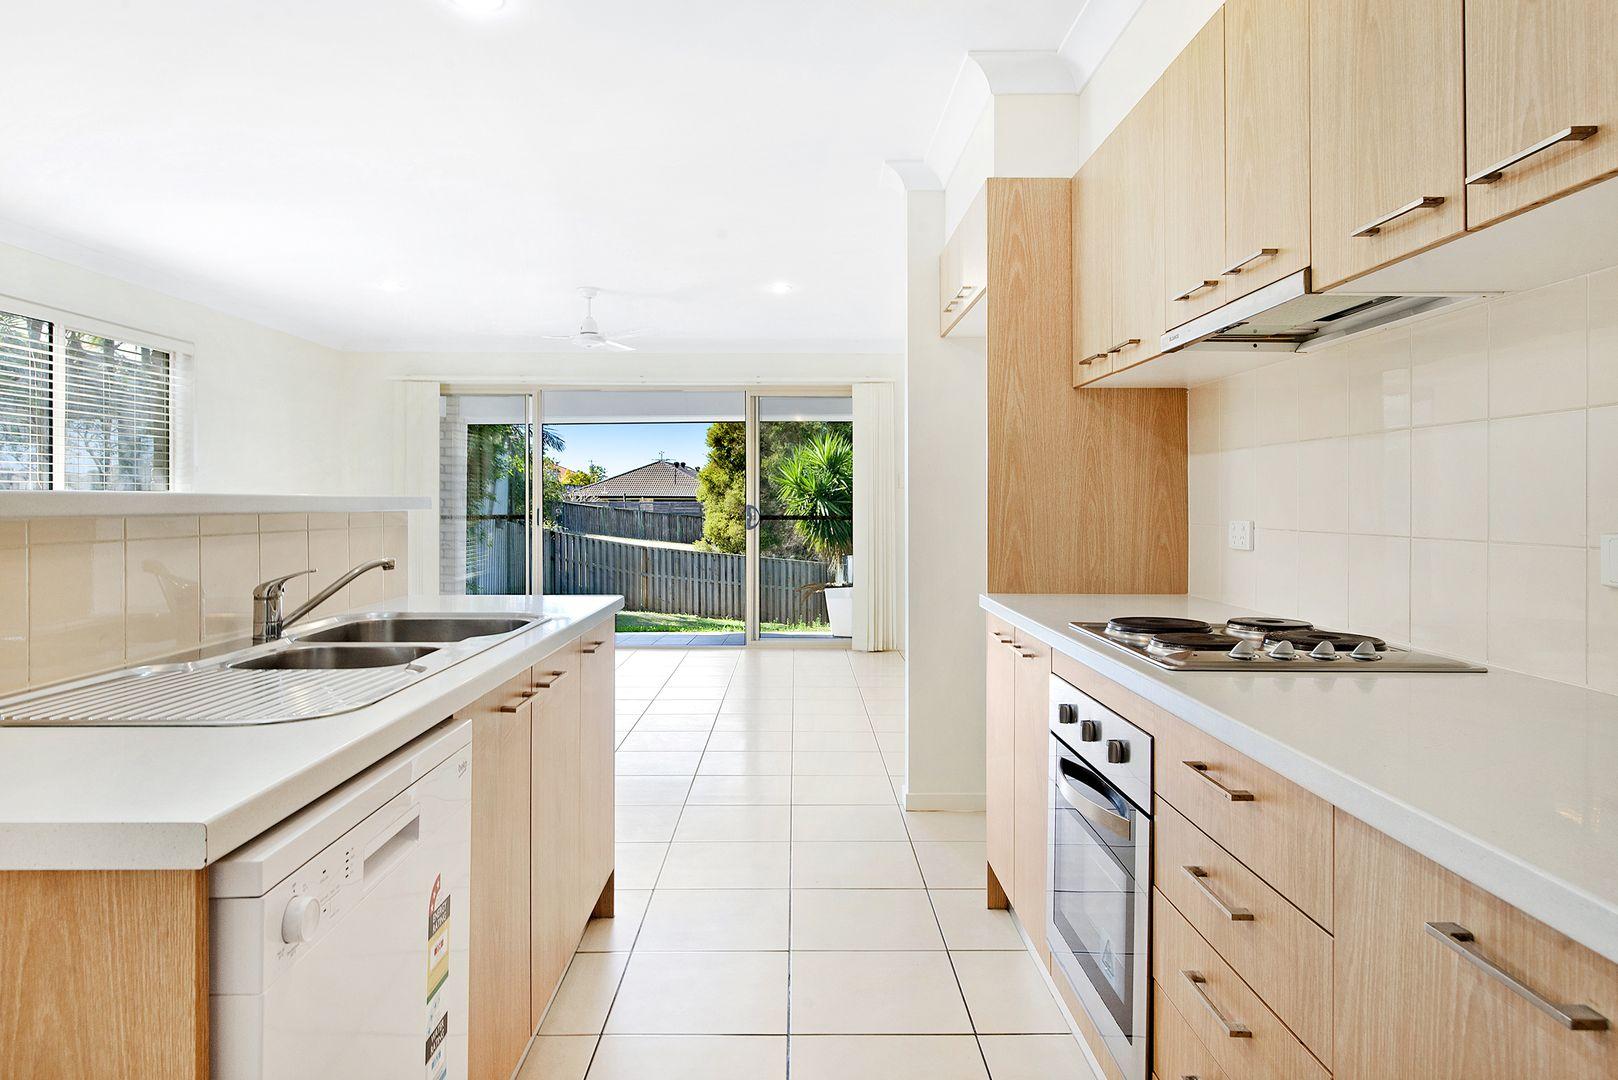 1/12 Pecan Drive, Upper Coomera QLD 4209, Image 0